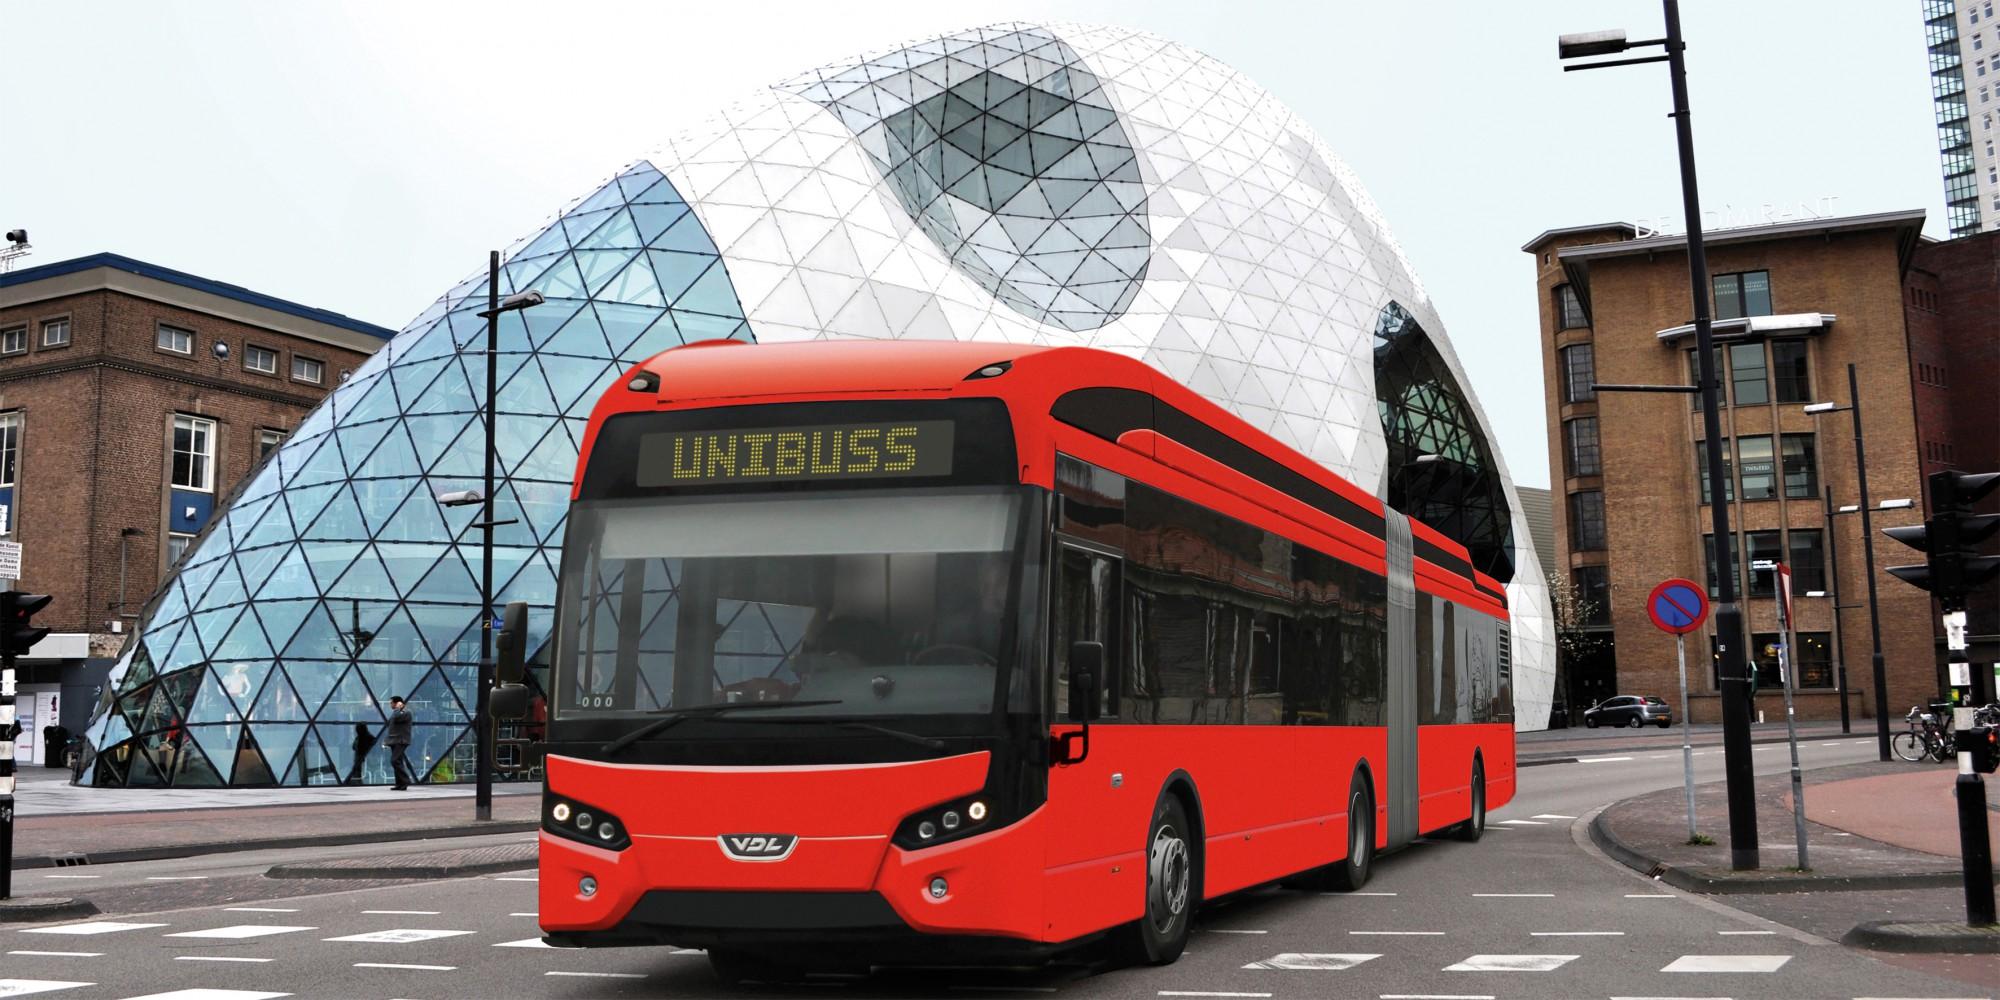 Powering Scandinavia's biggest e-bus project in Norway